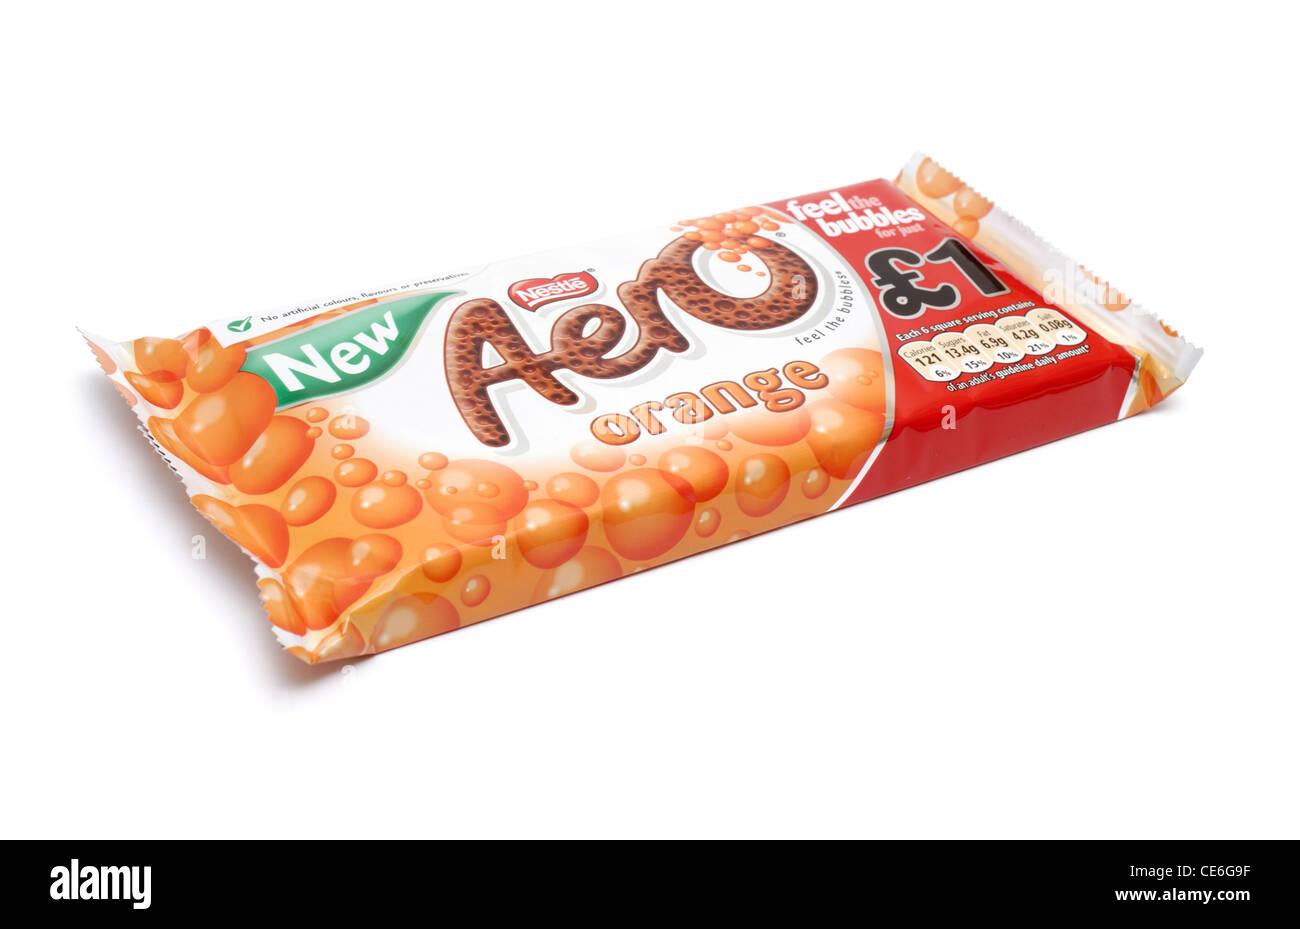 Orange Aero chocolate bar - Stock Image